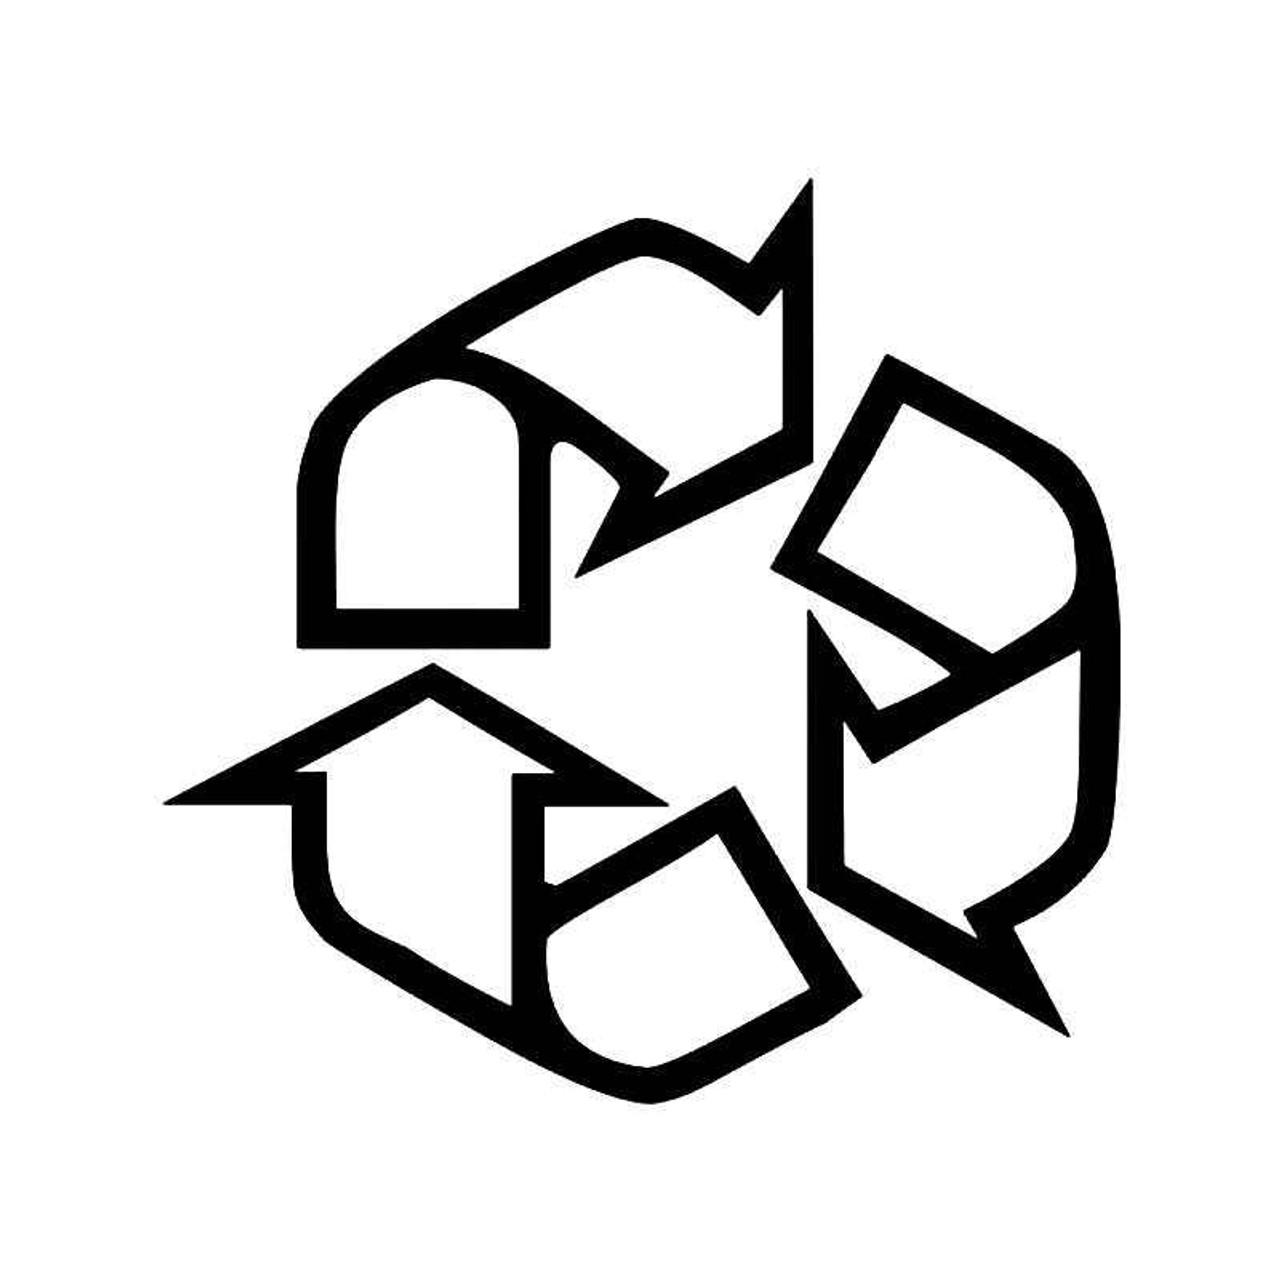 Recycle Trash Symbol 5 Vinyl Sticker